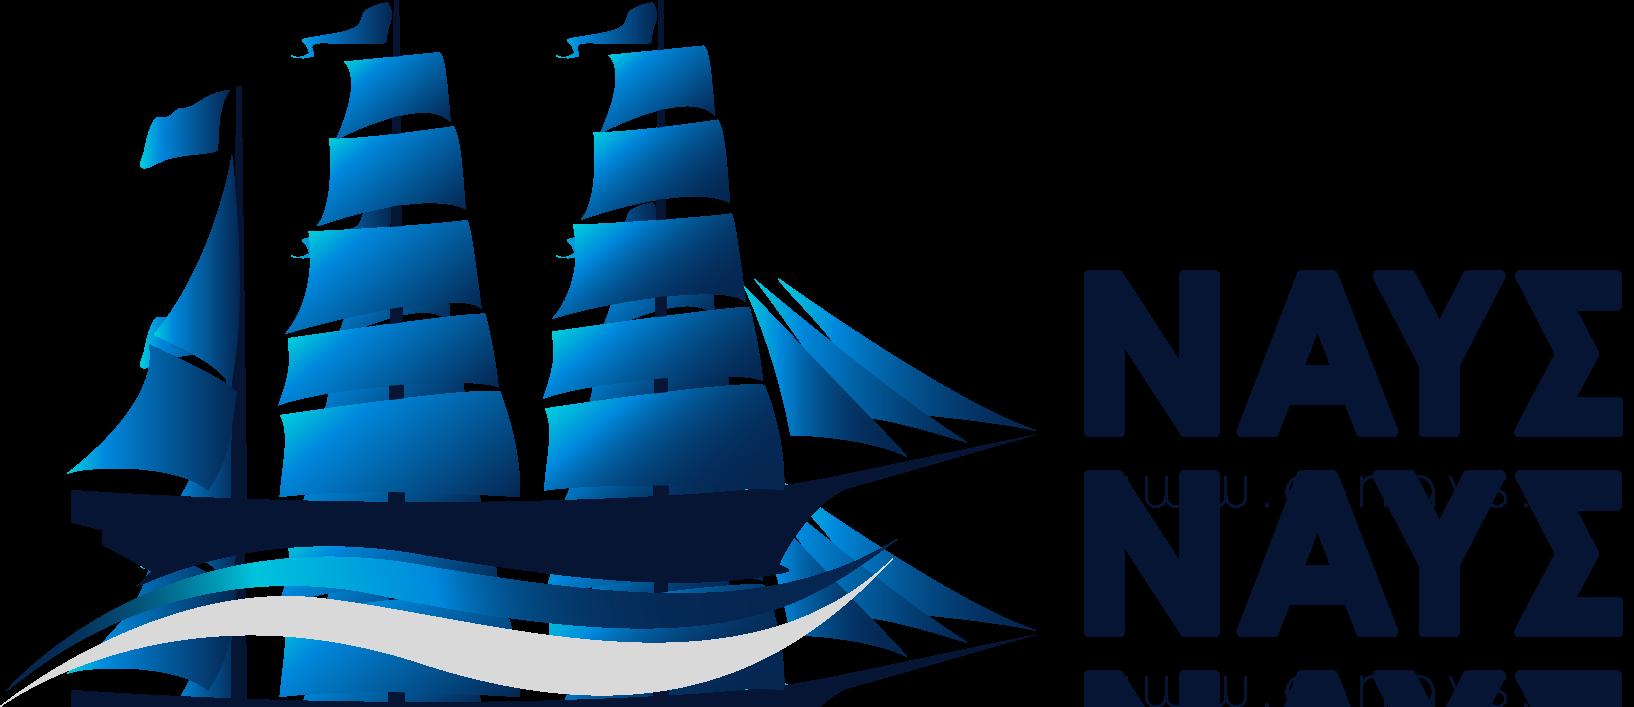 E-Navs.eu